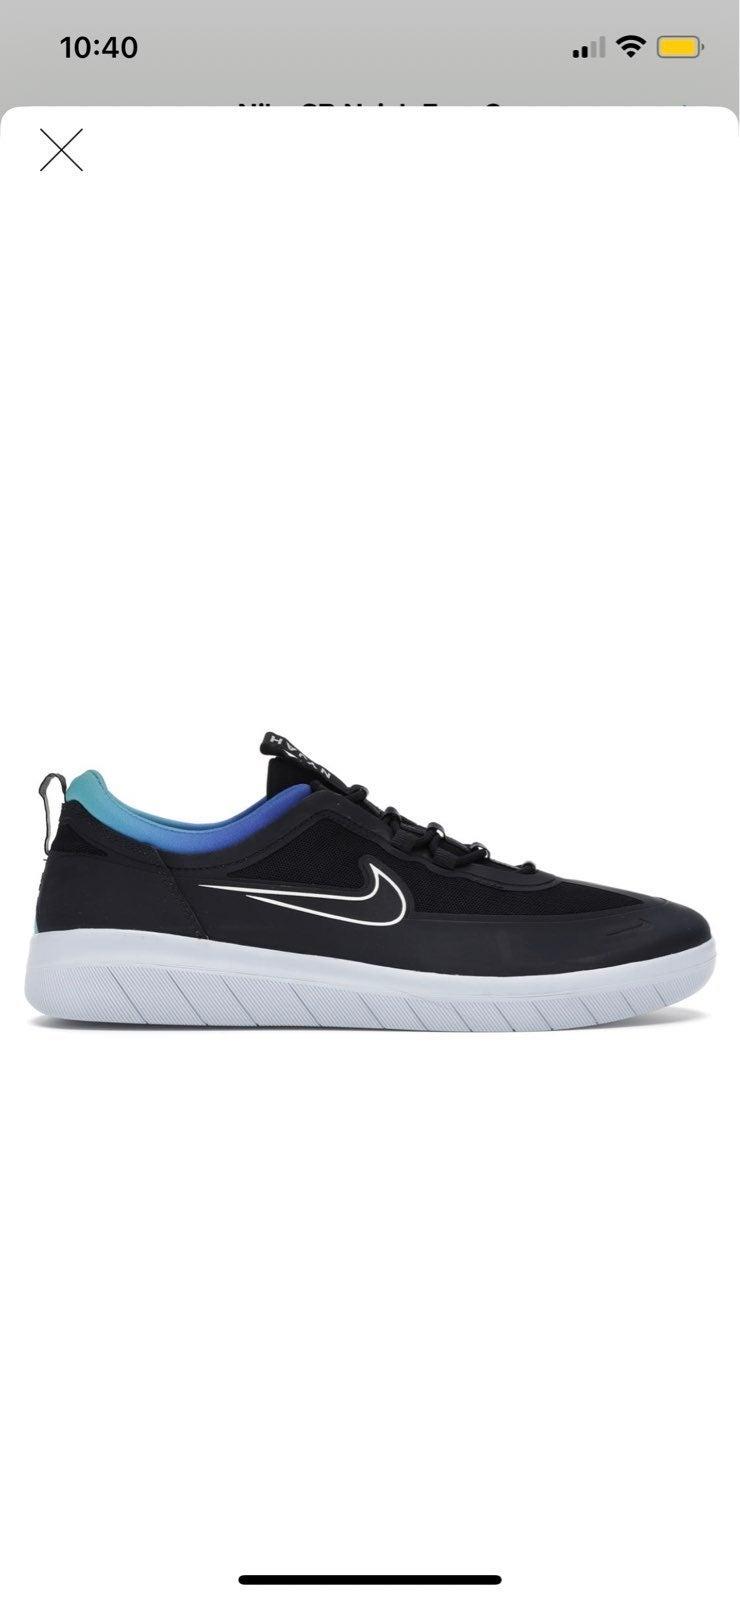 Nike SB Nyjah Free 2 T